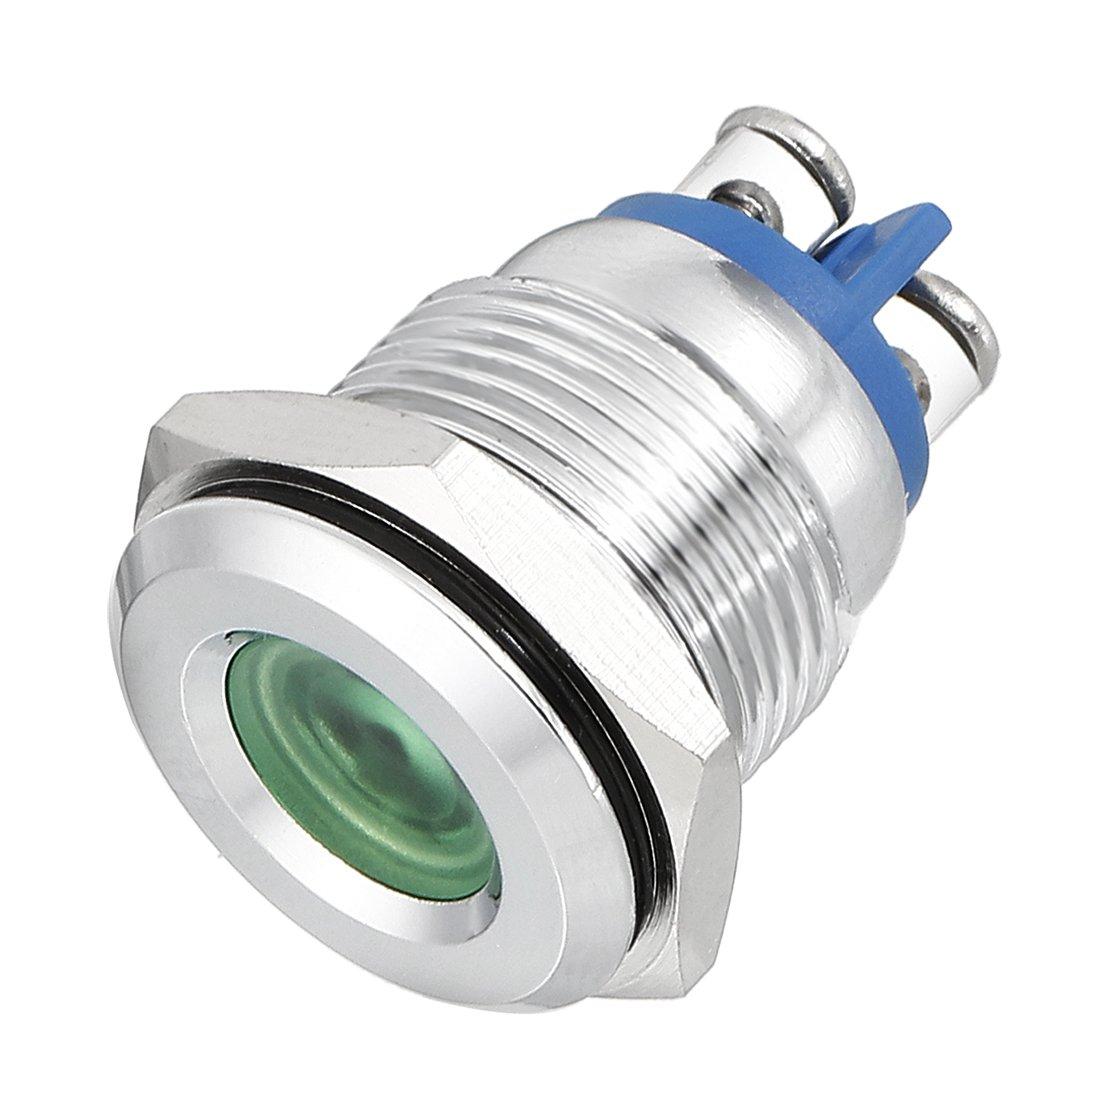 uxcell LED Indicator Light DC 12V 16mm Green Metal Shell Pilot Custom Dash Signal Lamp Flat Head